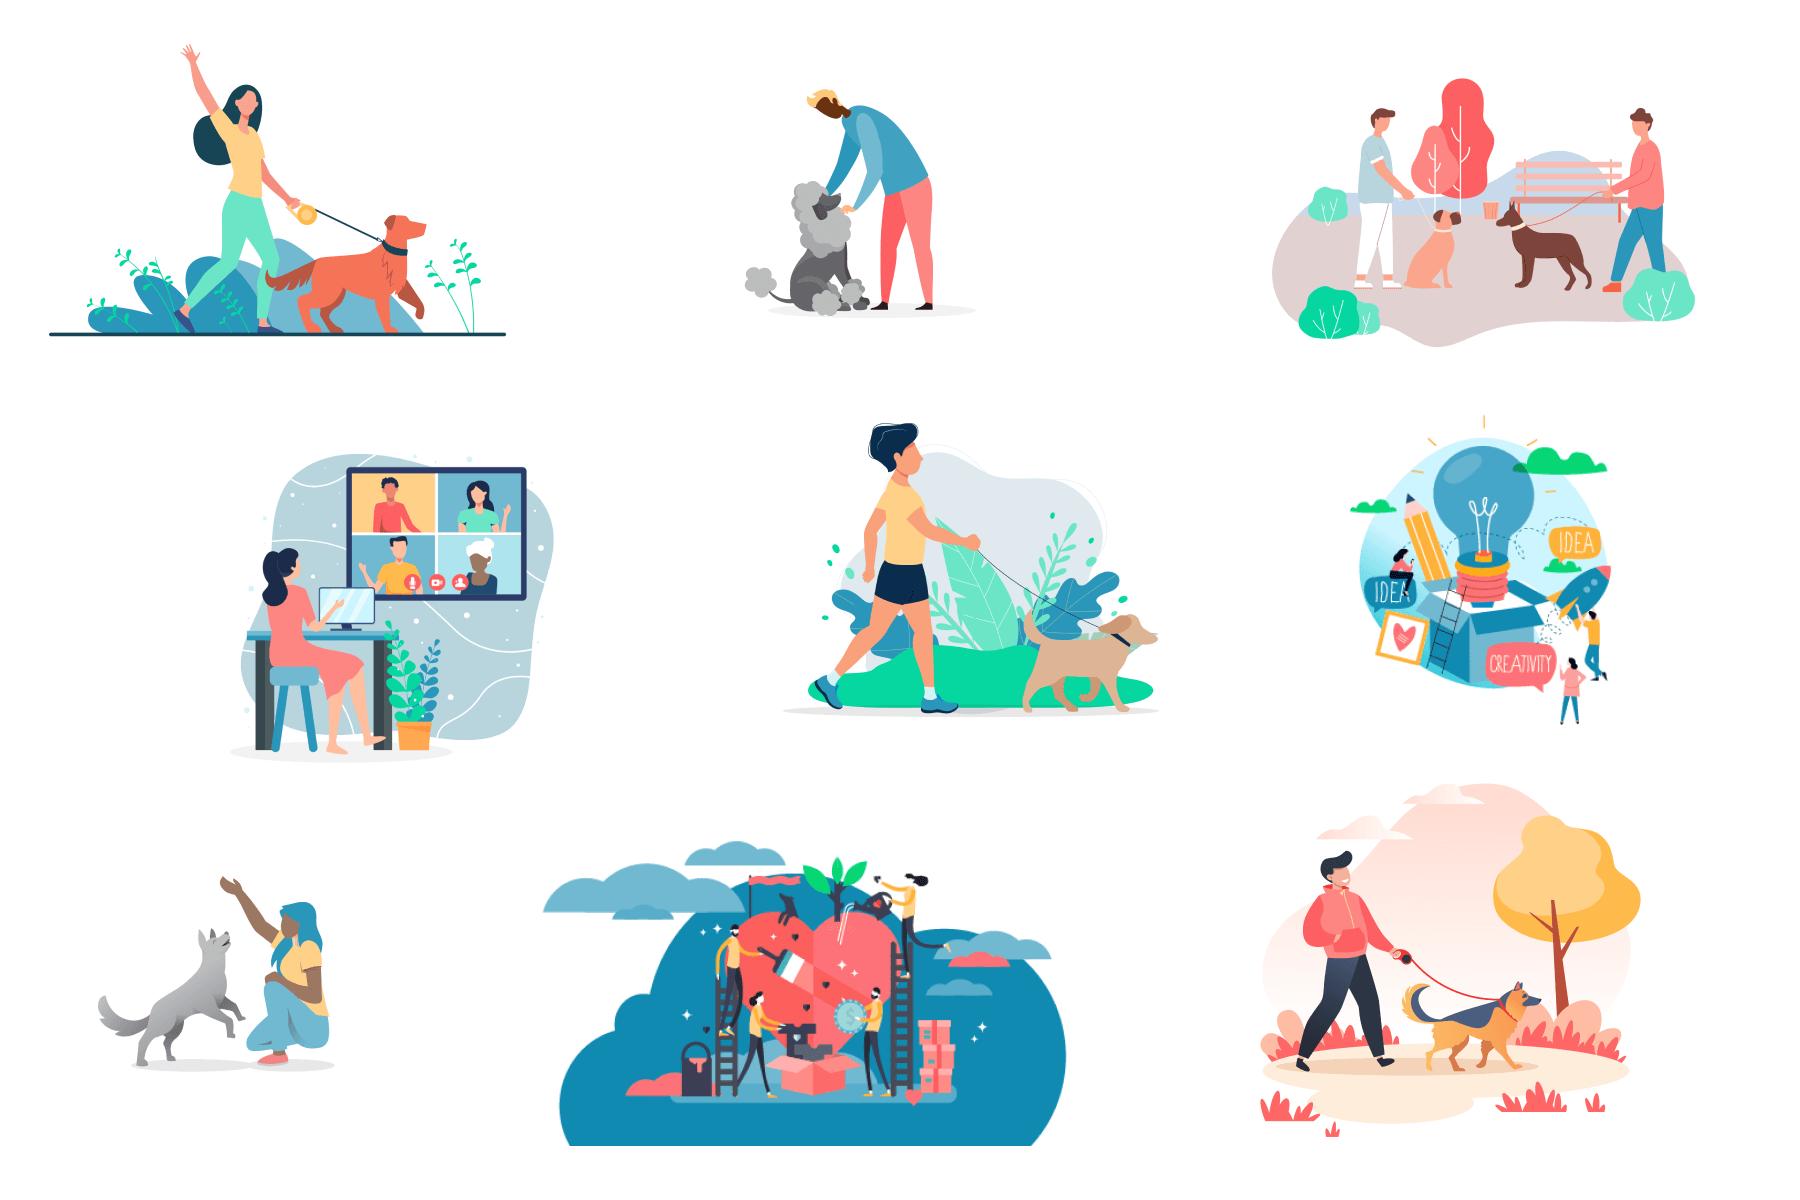 image of illustrations